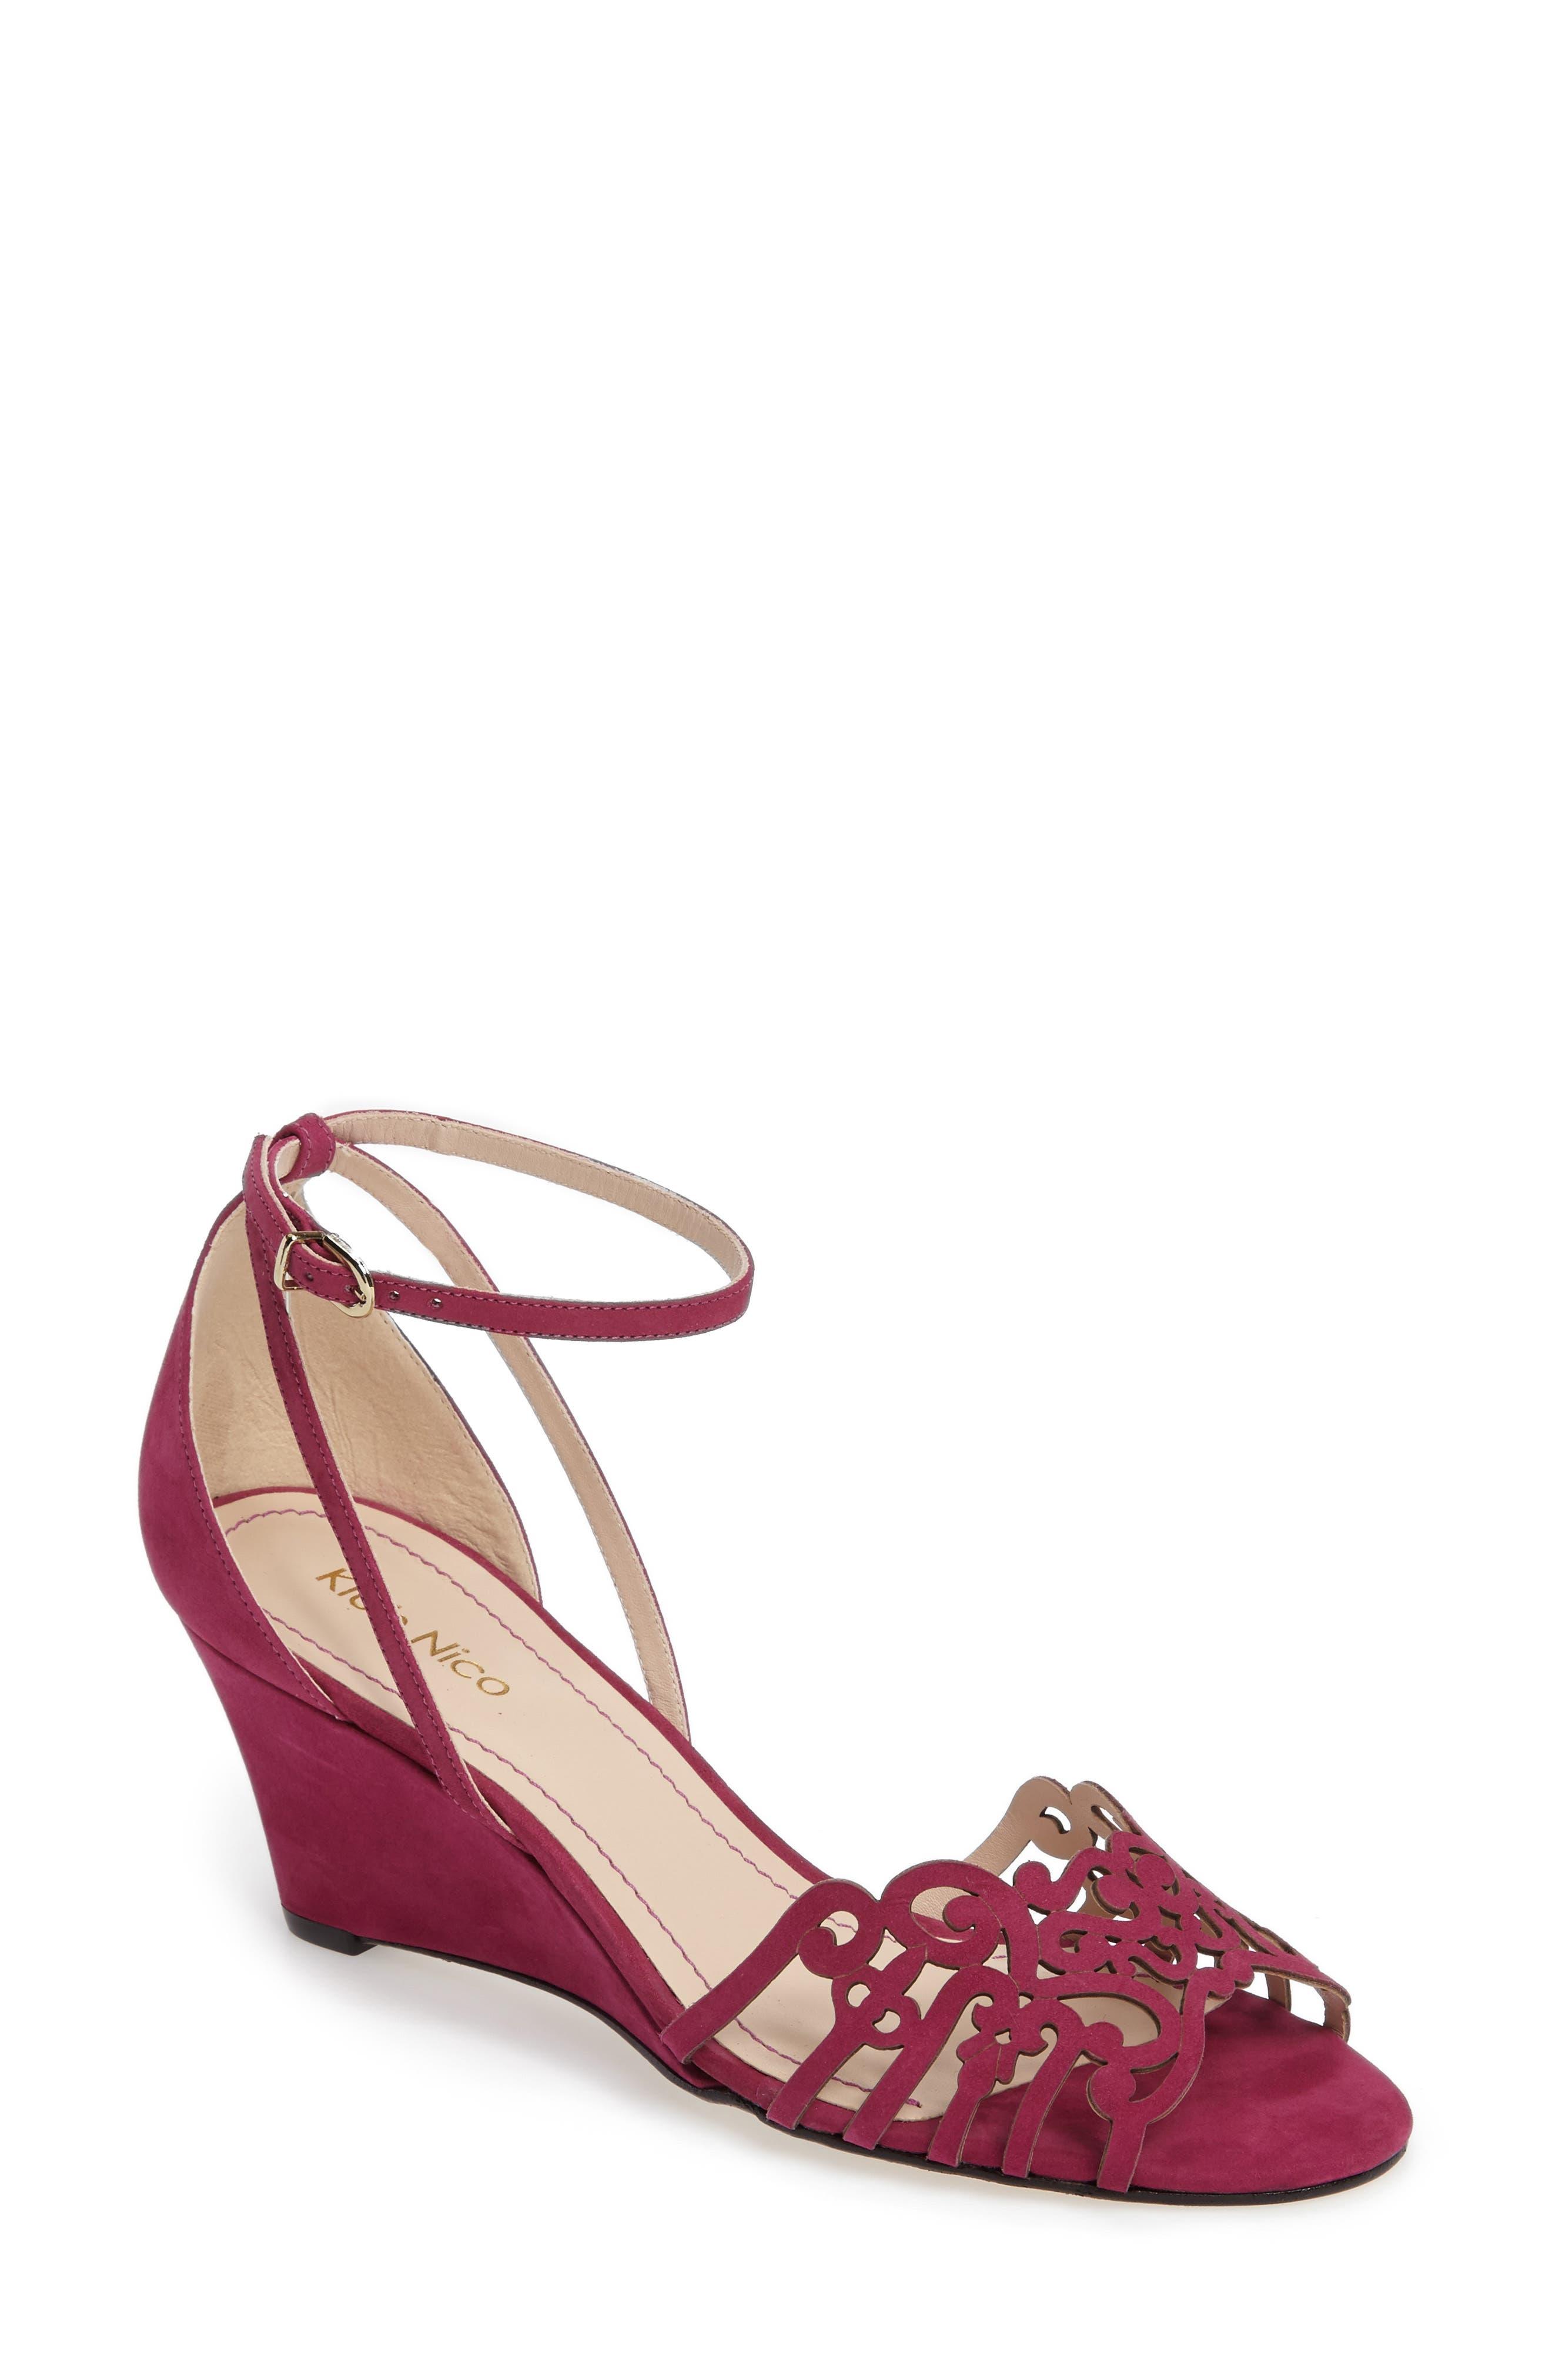 Main Image - Klub Nico 'Kingston' Ankle Strap Wedge Sandal (Women)